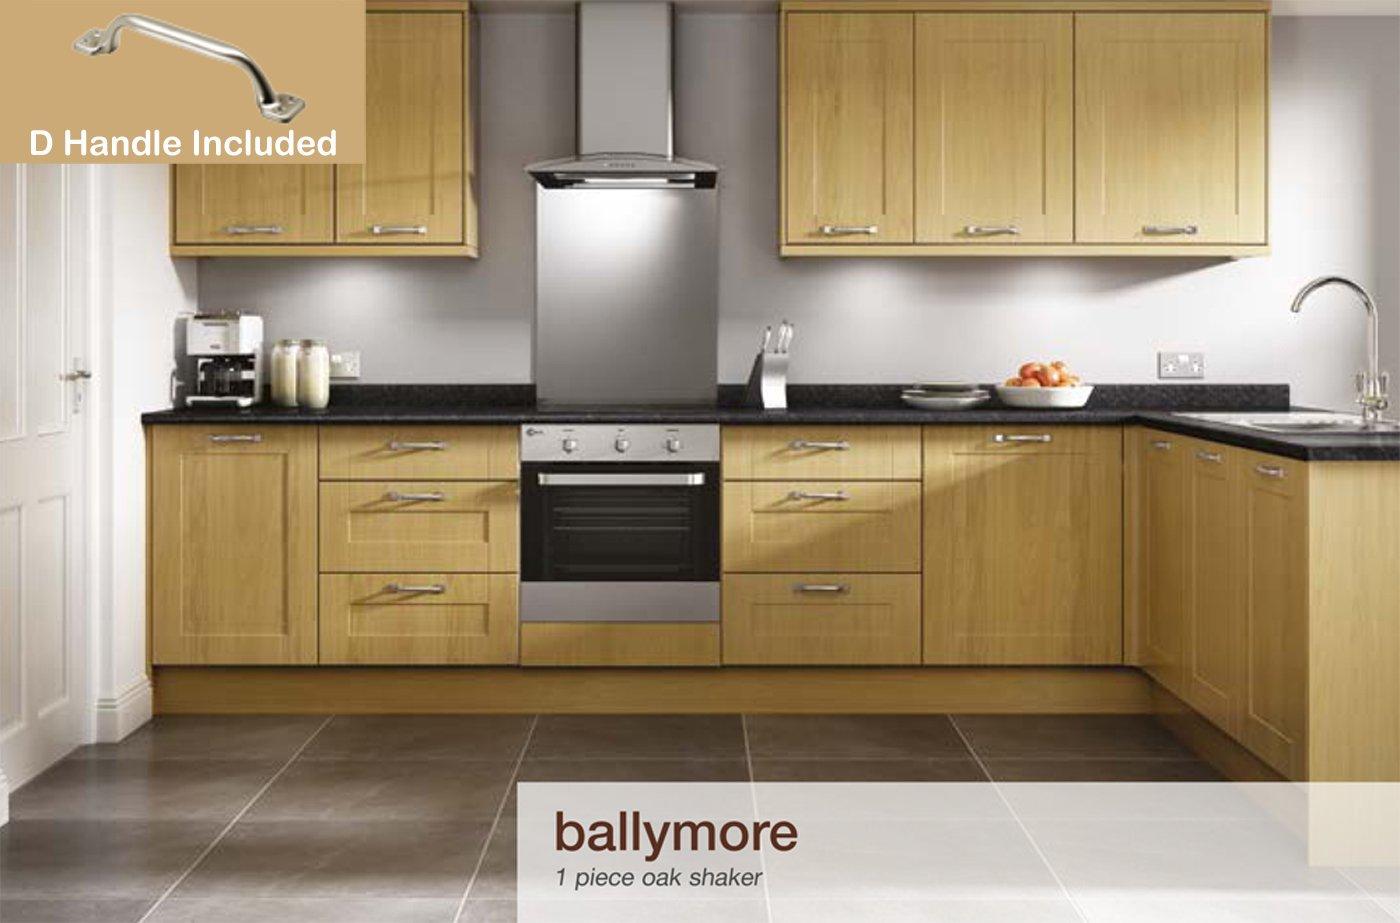 Ballymore Shaker Oak Kitchen Units 3m Cornicepelmet